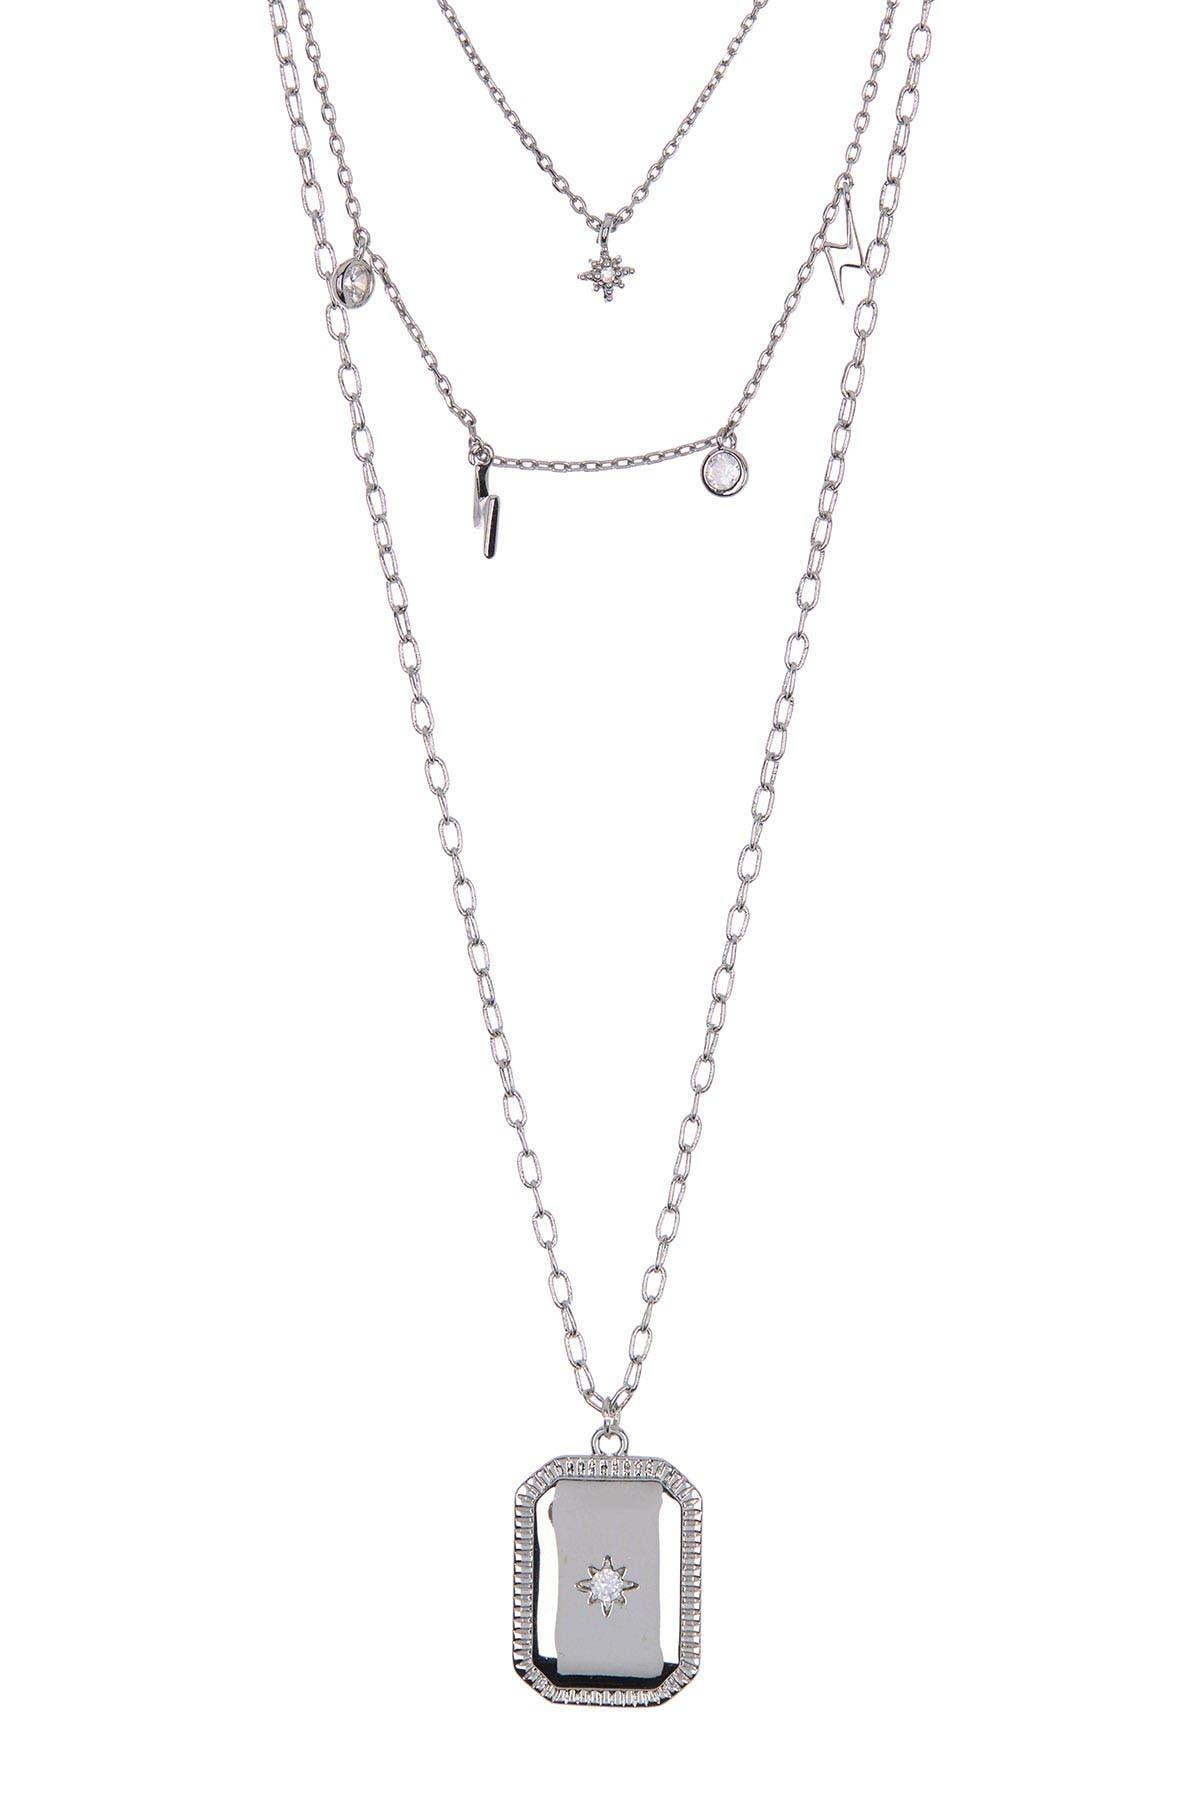 Image of Loren Olivia Stars & Lights Layered Necklace Set